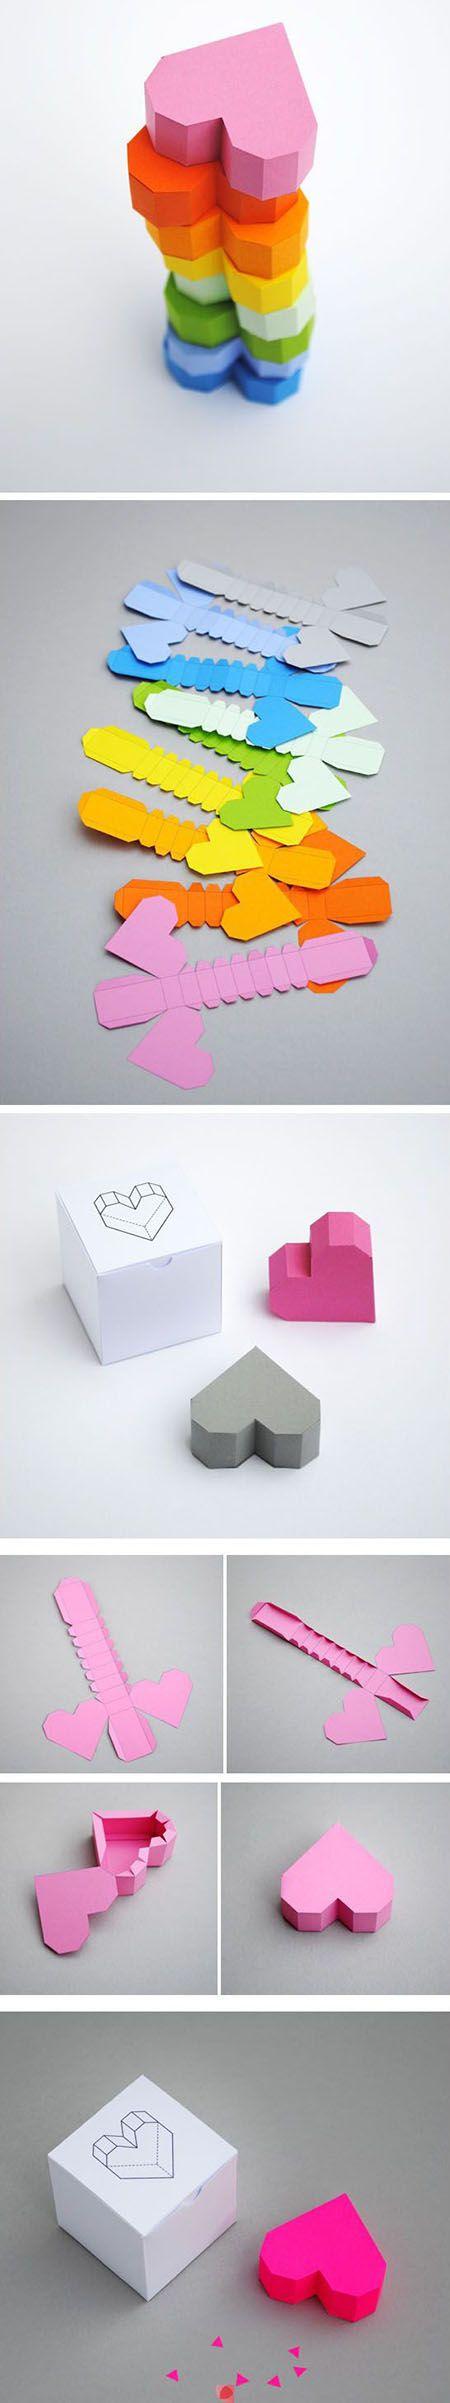 Diy Cute Gift Box   DIY & Crafts Tutorials